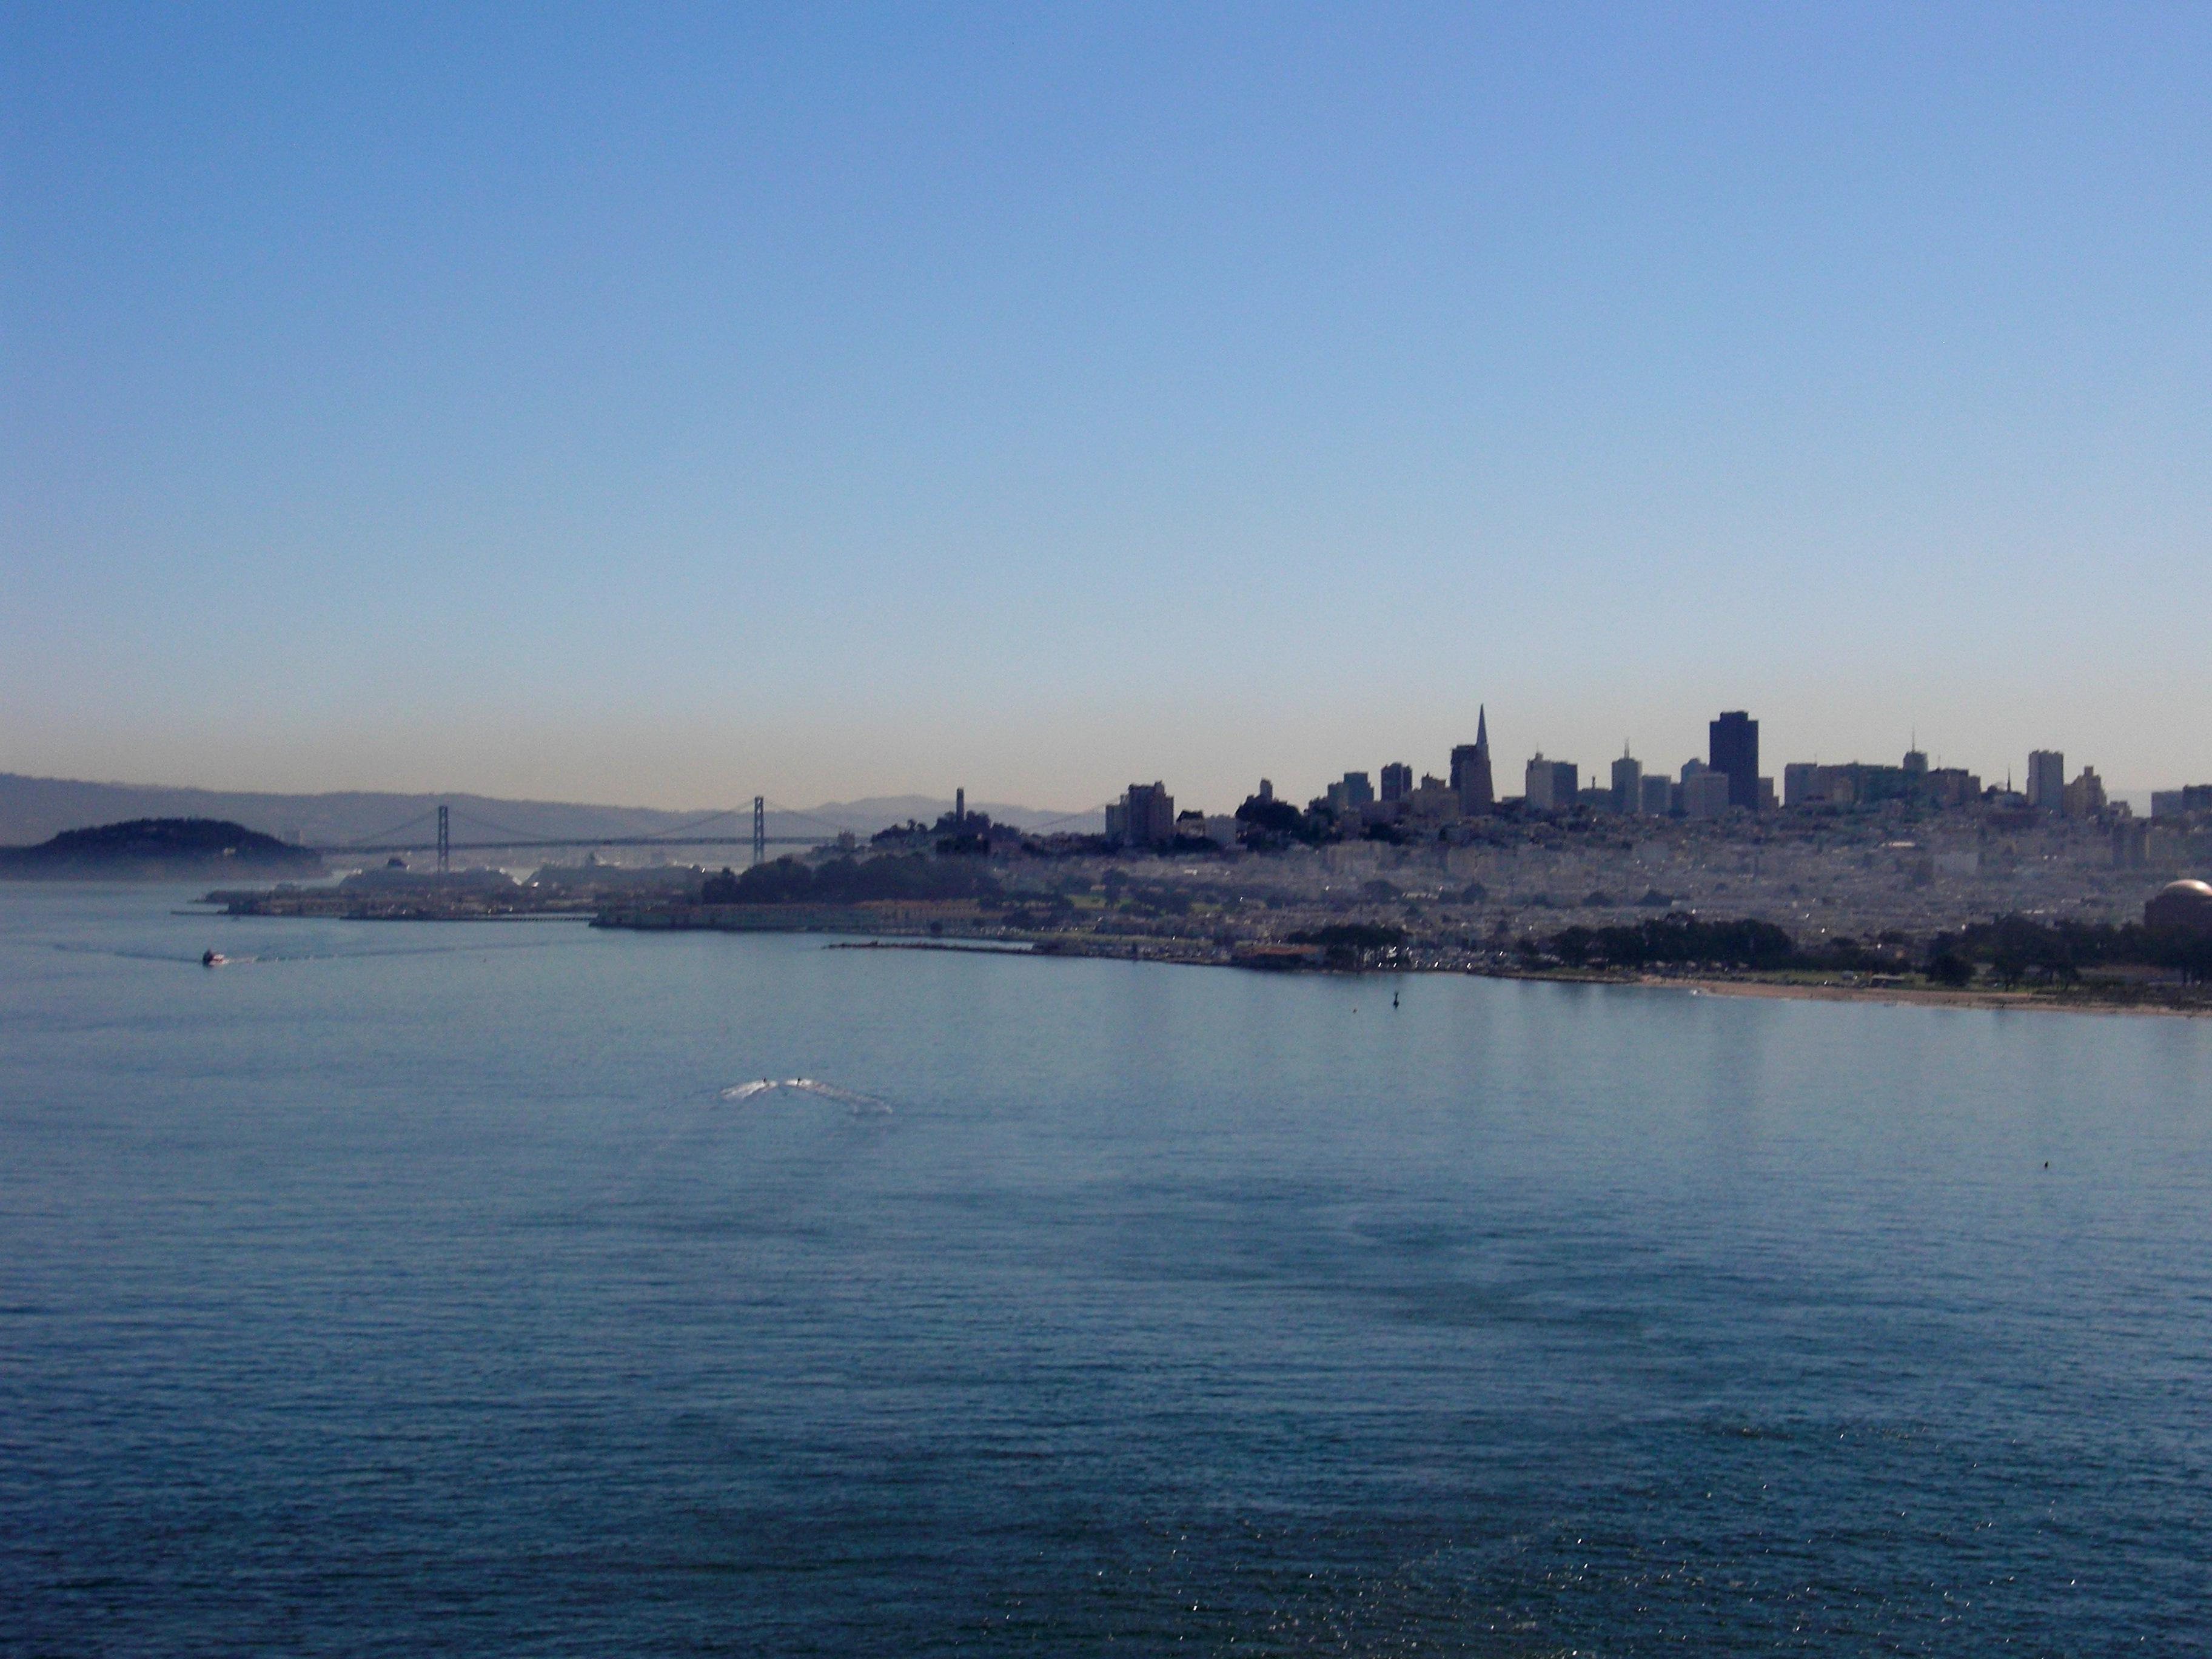 California, Bay, Bayarea, Baybridge, Citybythebay, HQ Photo